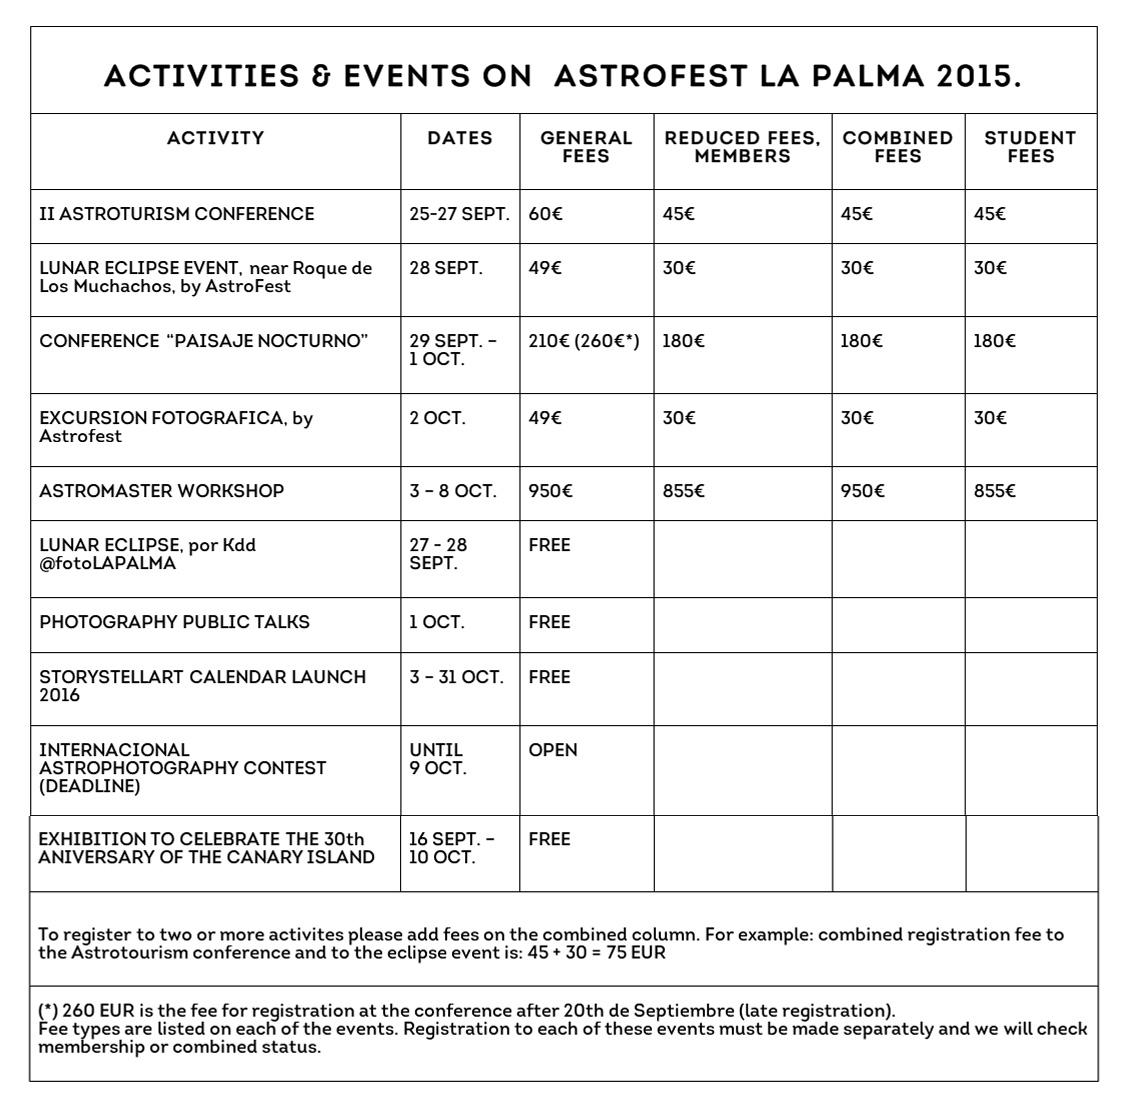 activitiesPrice-astrofestlapalma2015